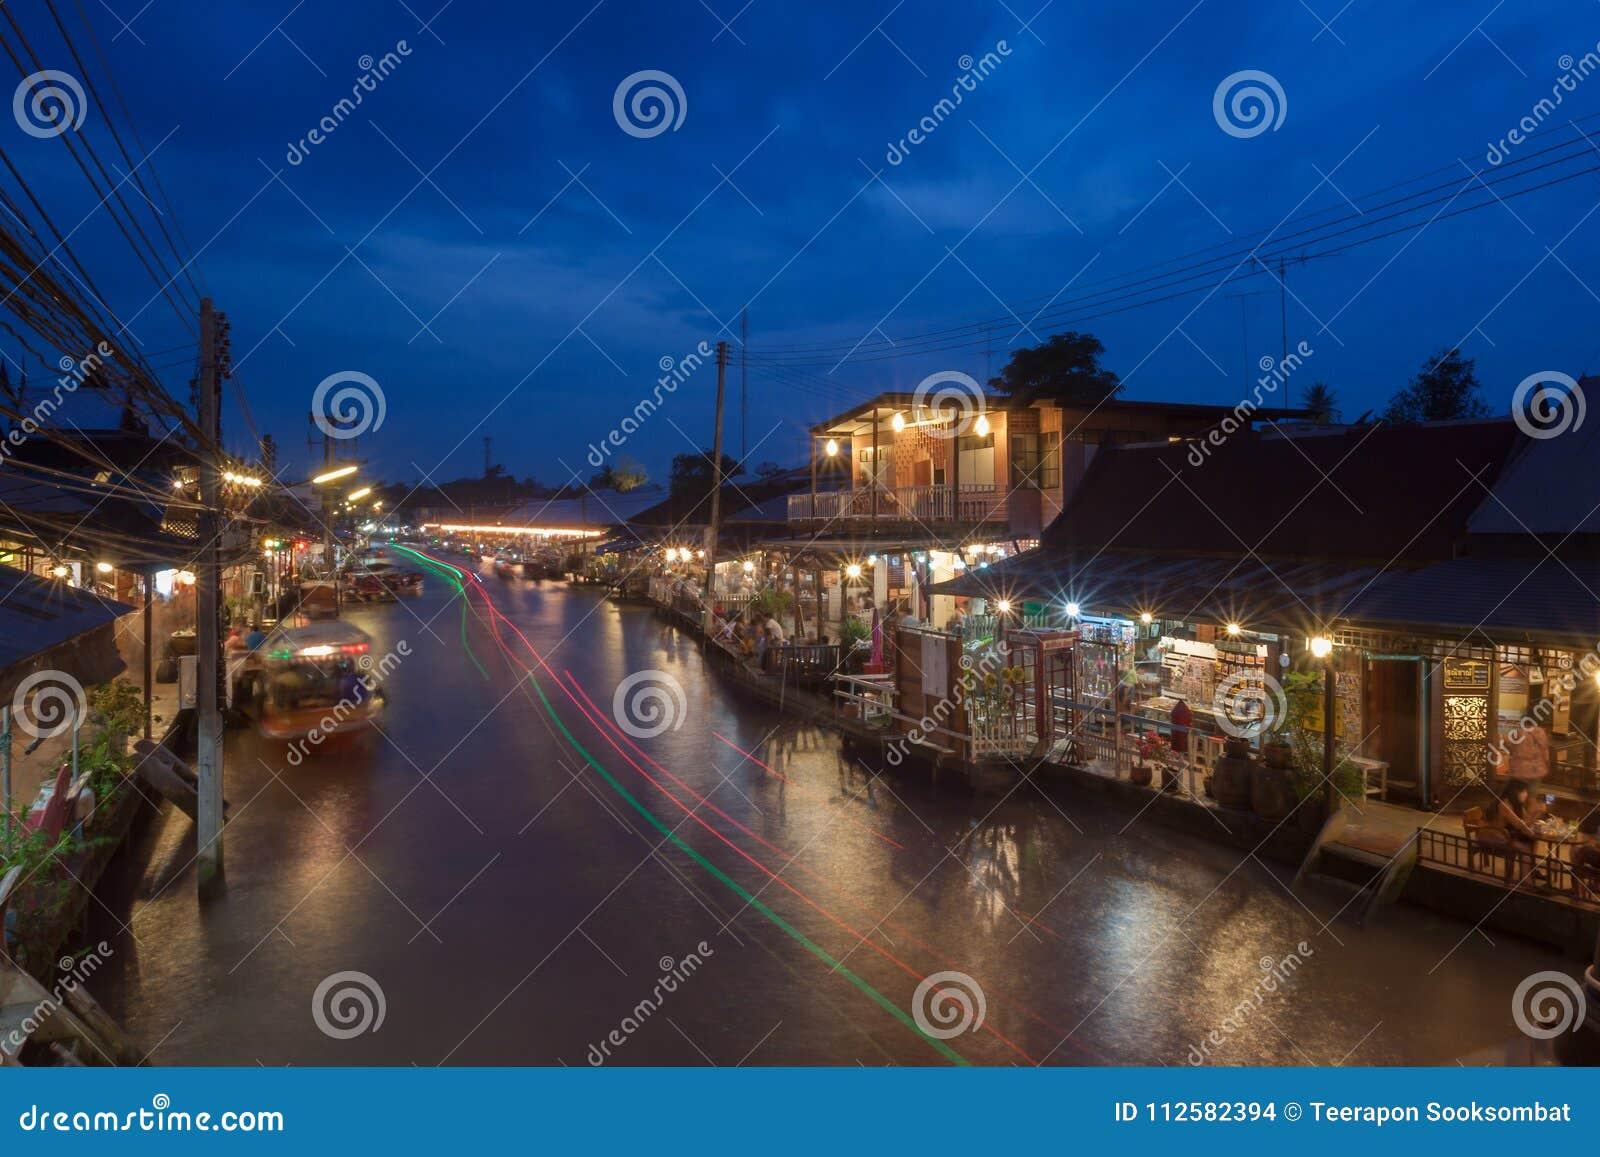 Floating market at night in Amphawa, Samut Songkhram , Thailand.